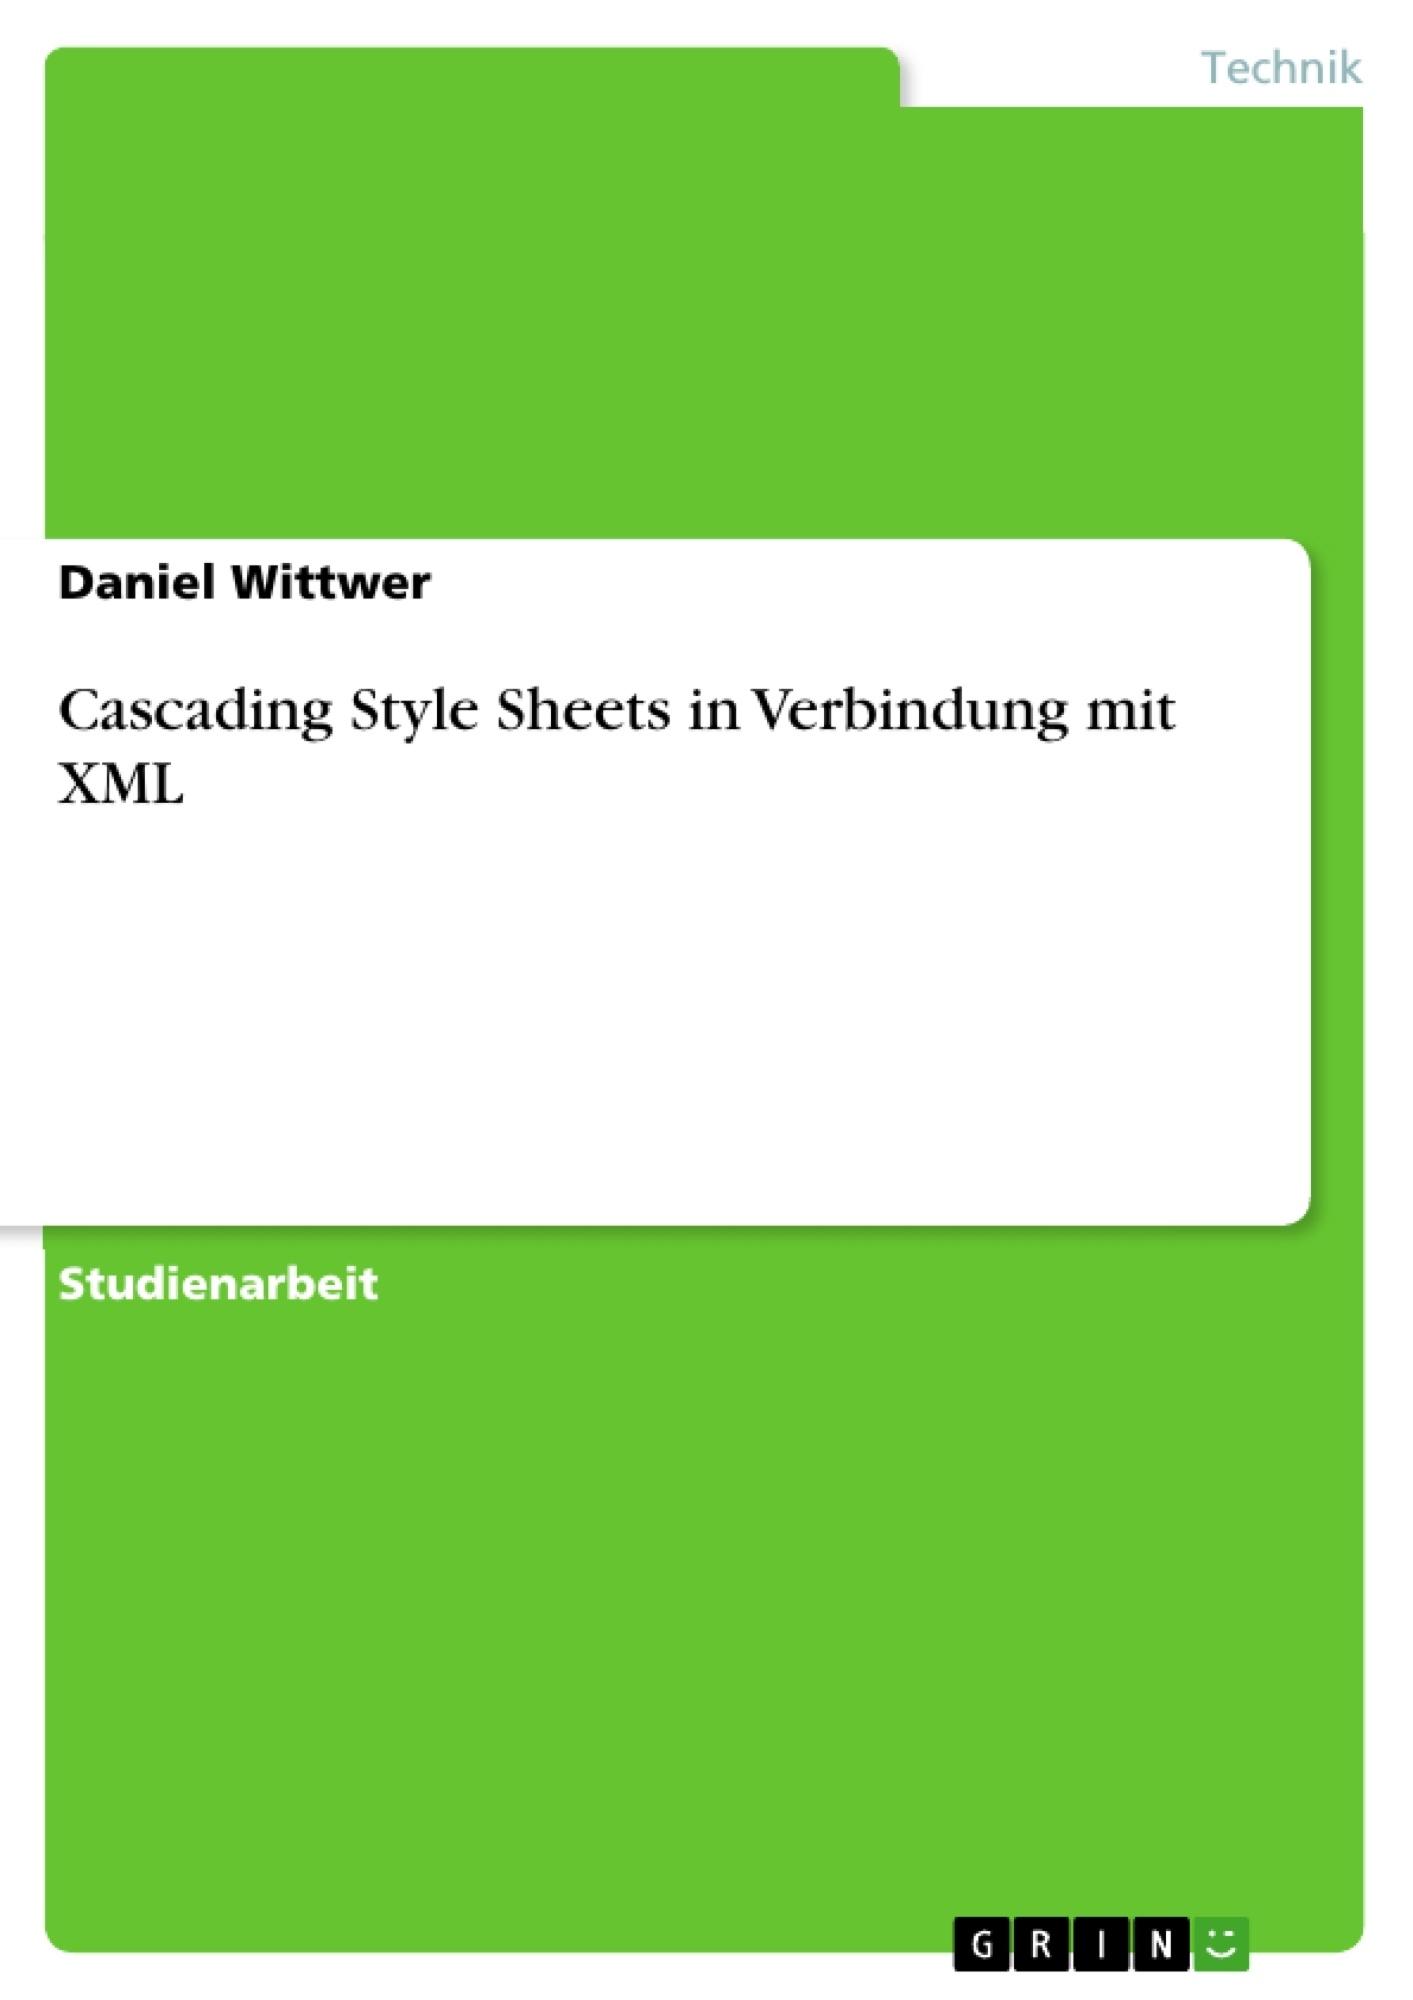 Titel: Cascading Style Sheets in Verbindung mit XML